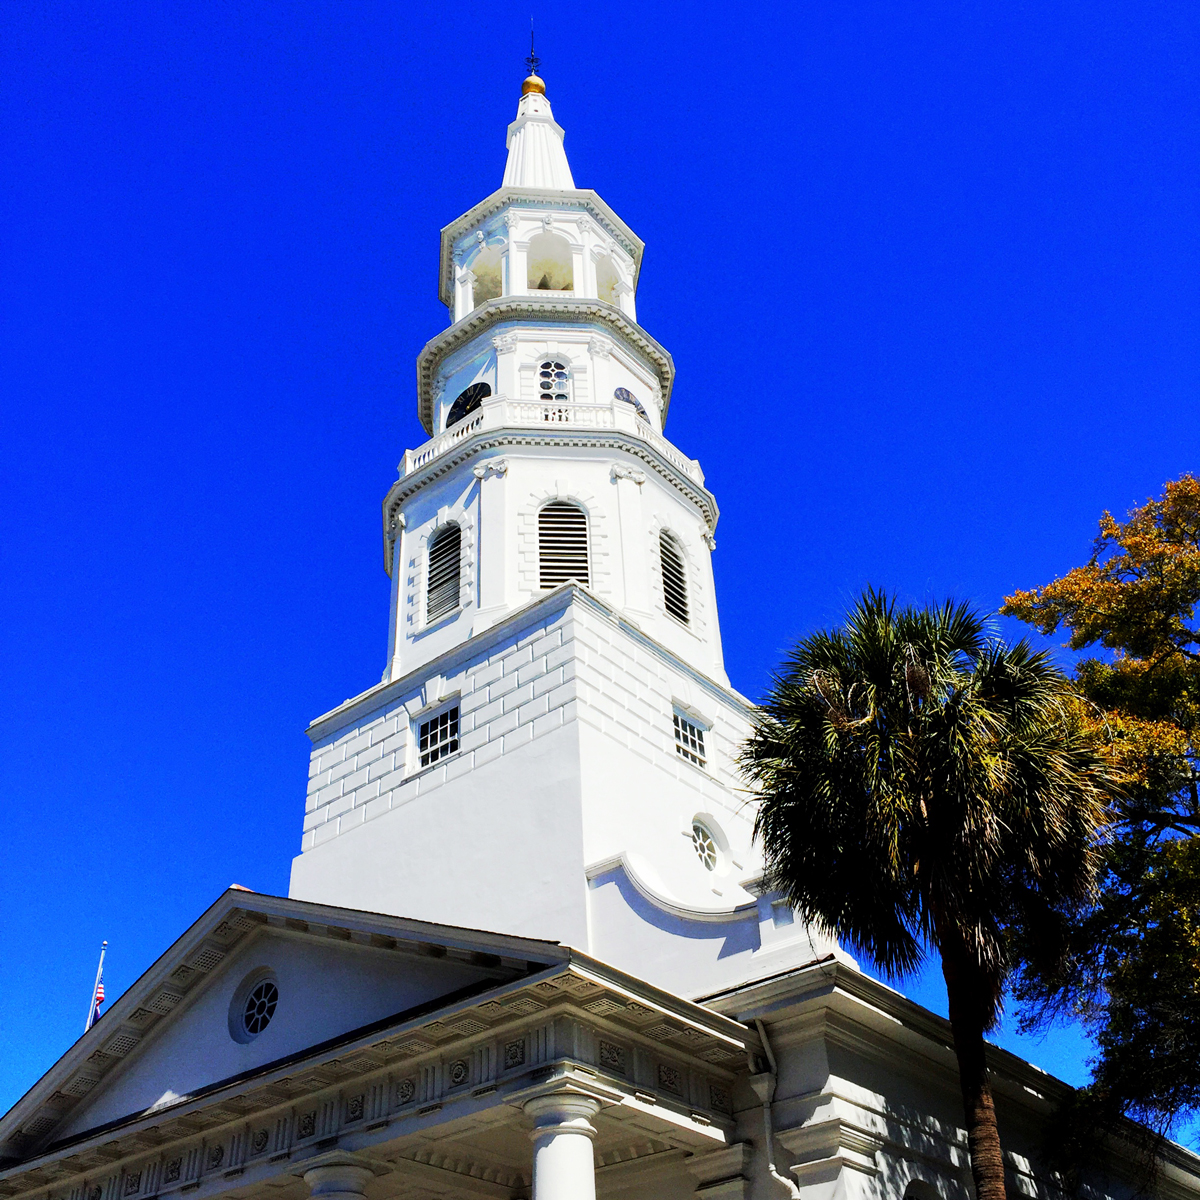 St. Michael's Episcopal Church. 71 Broad Street.